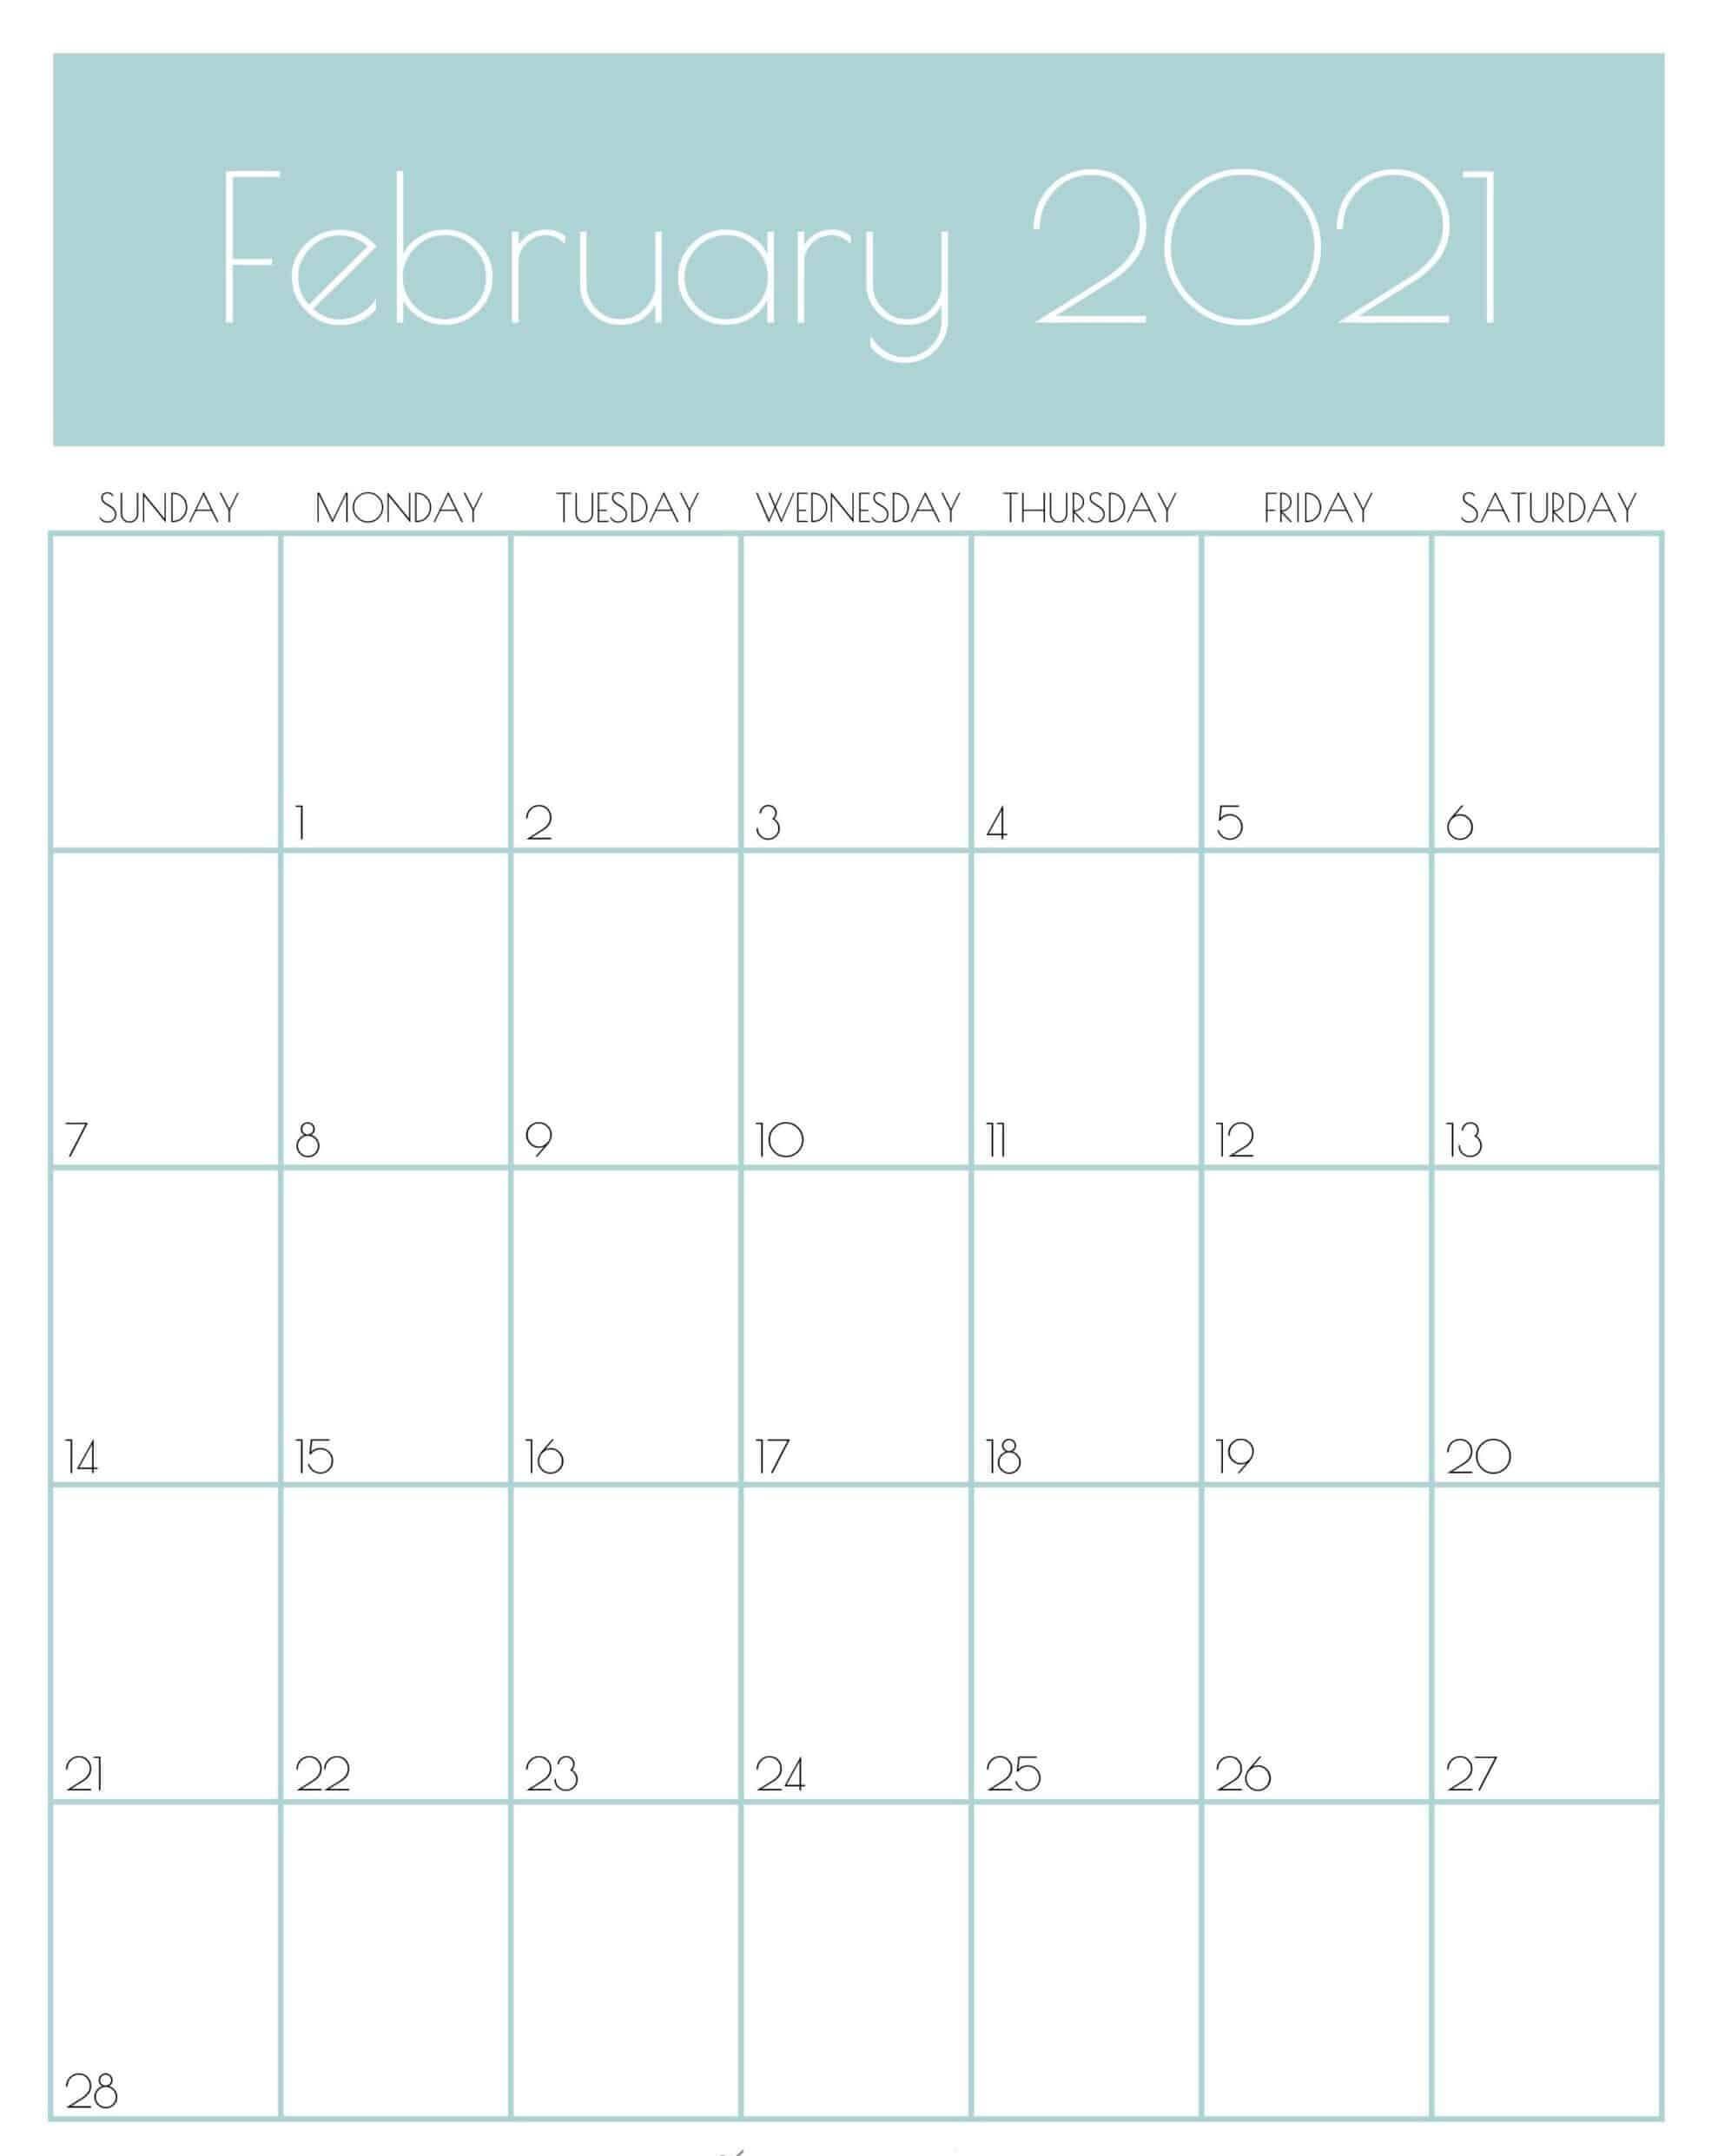 February 2021 Wall Calendar